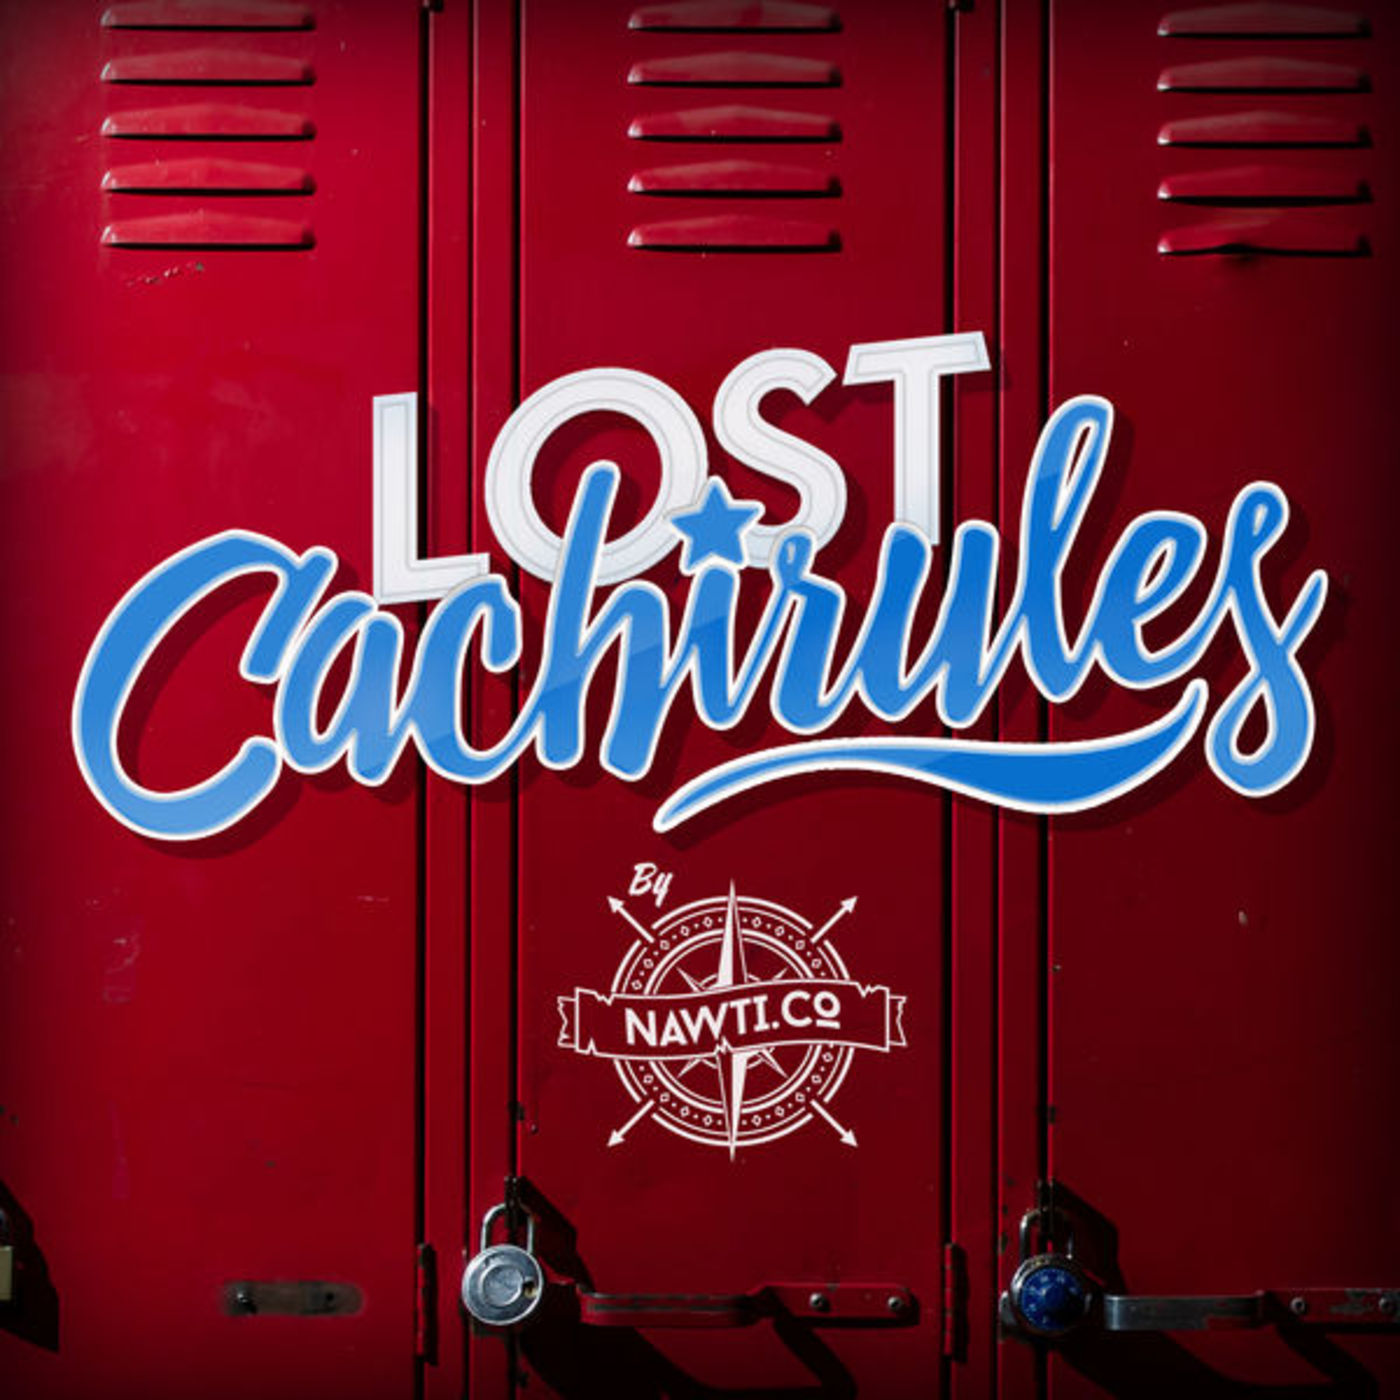 <![CDATA[Lost Cachirules]]>